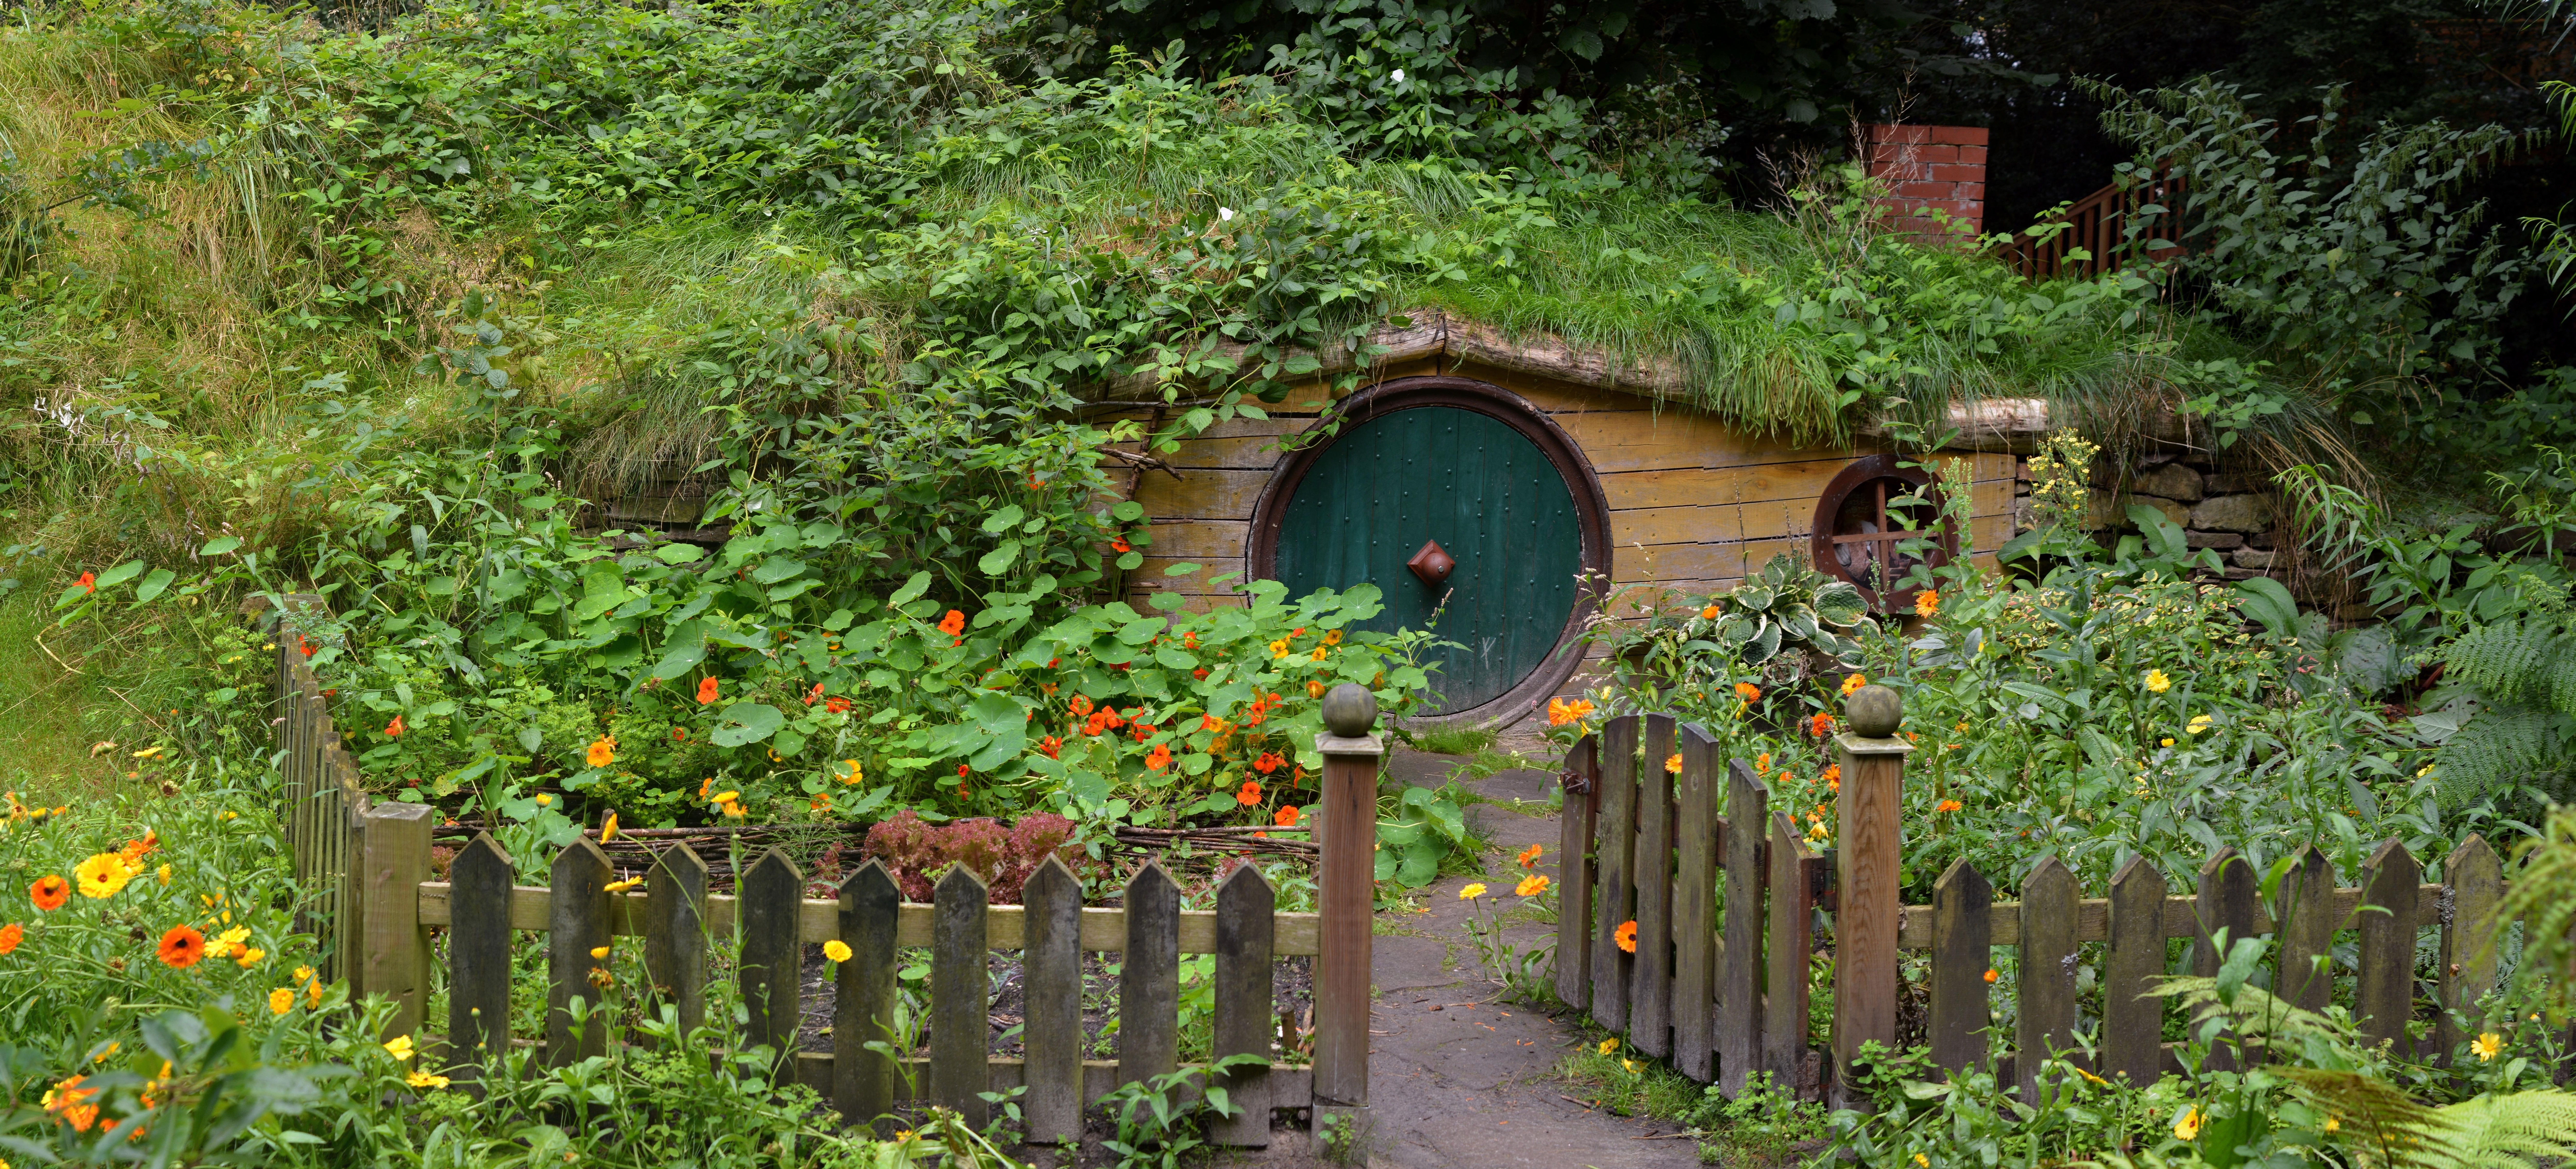 Flower Village Live Cave Jungle Cottage Backyard Agriculture Garden Shrub  Woodland Yard Hobbit Hobbit House Rural